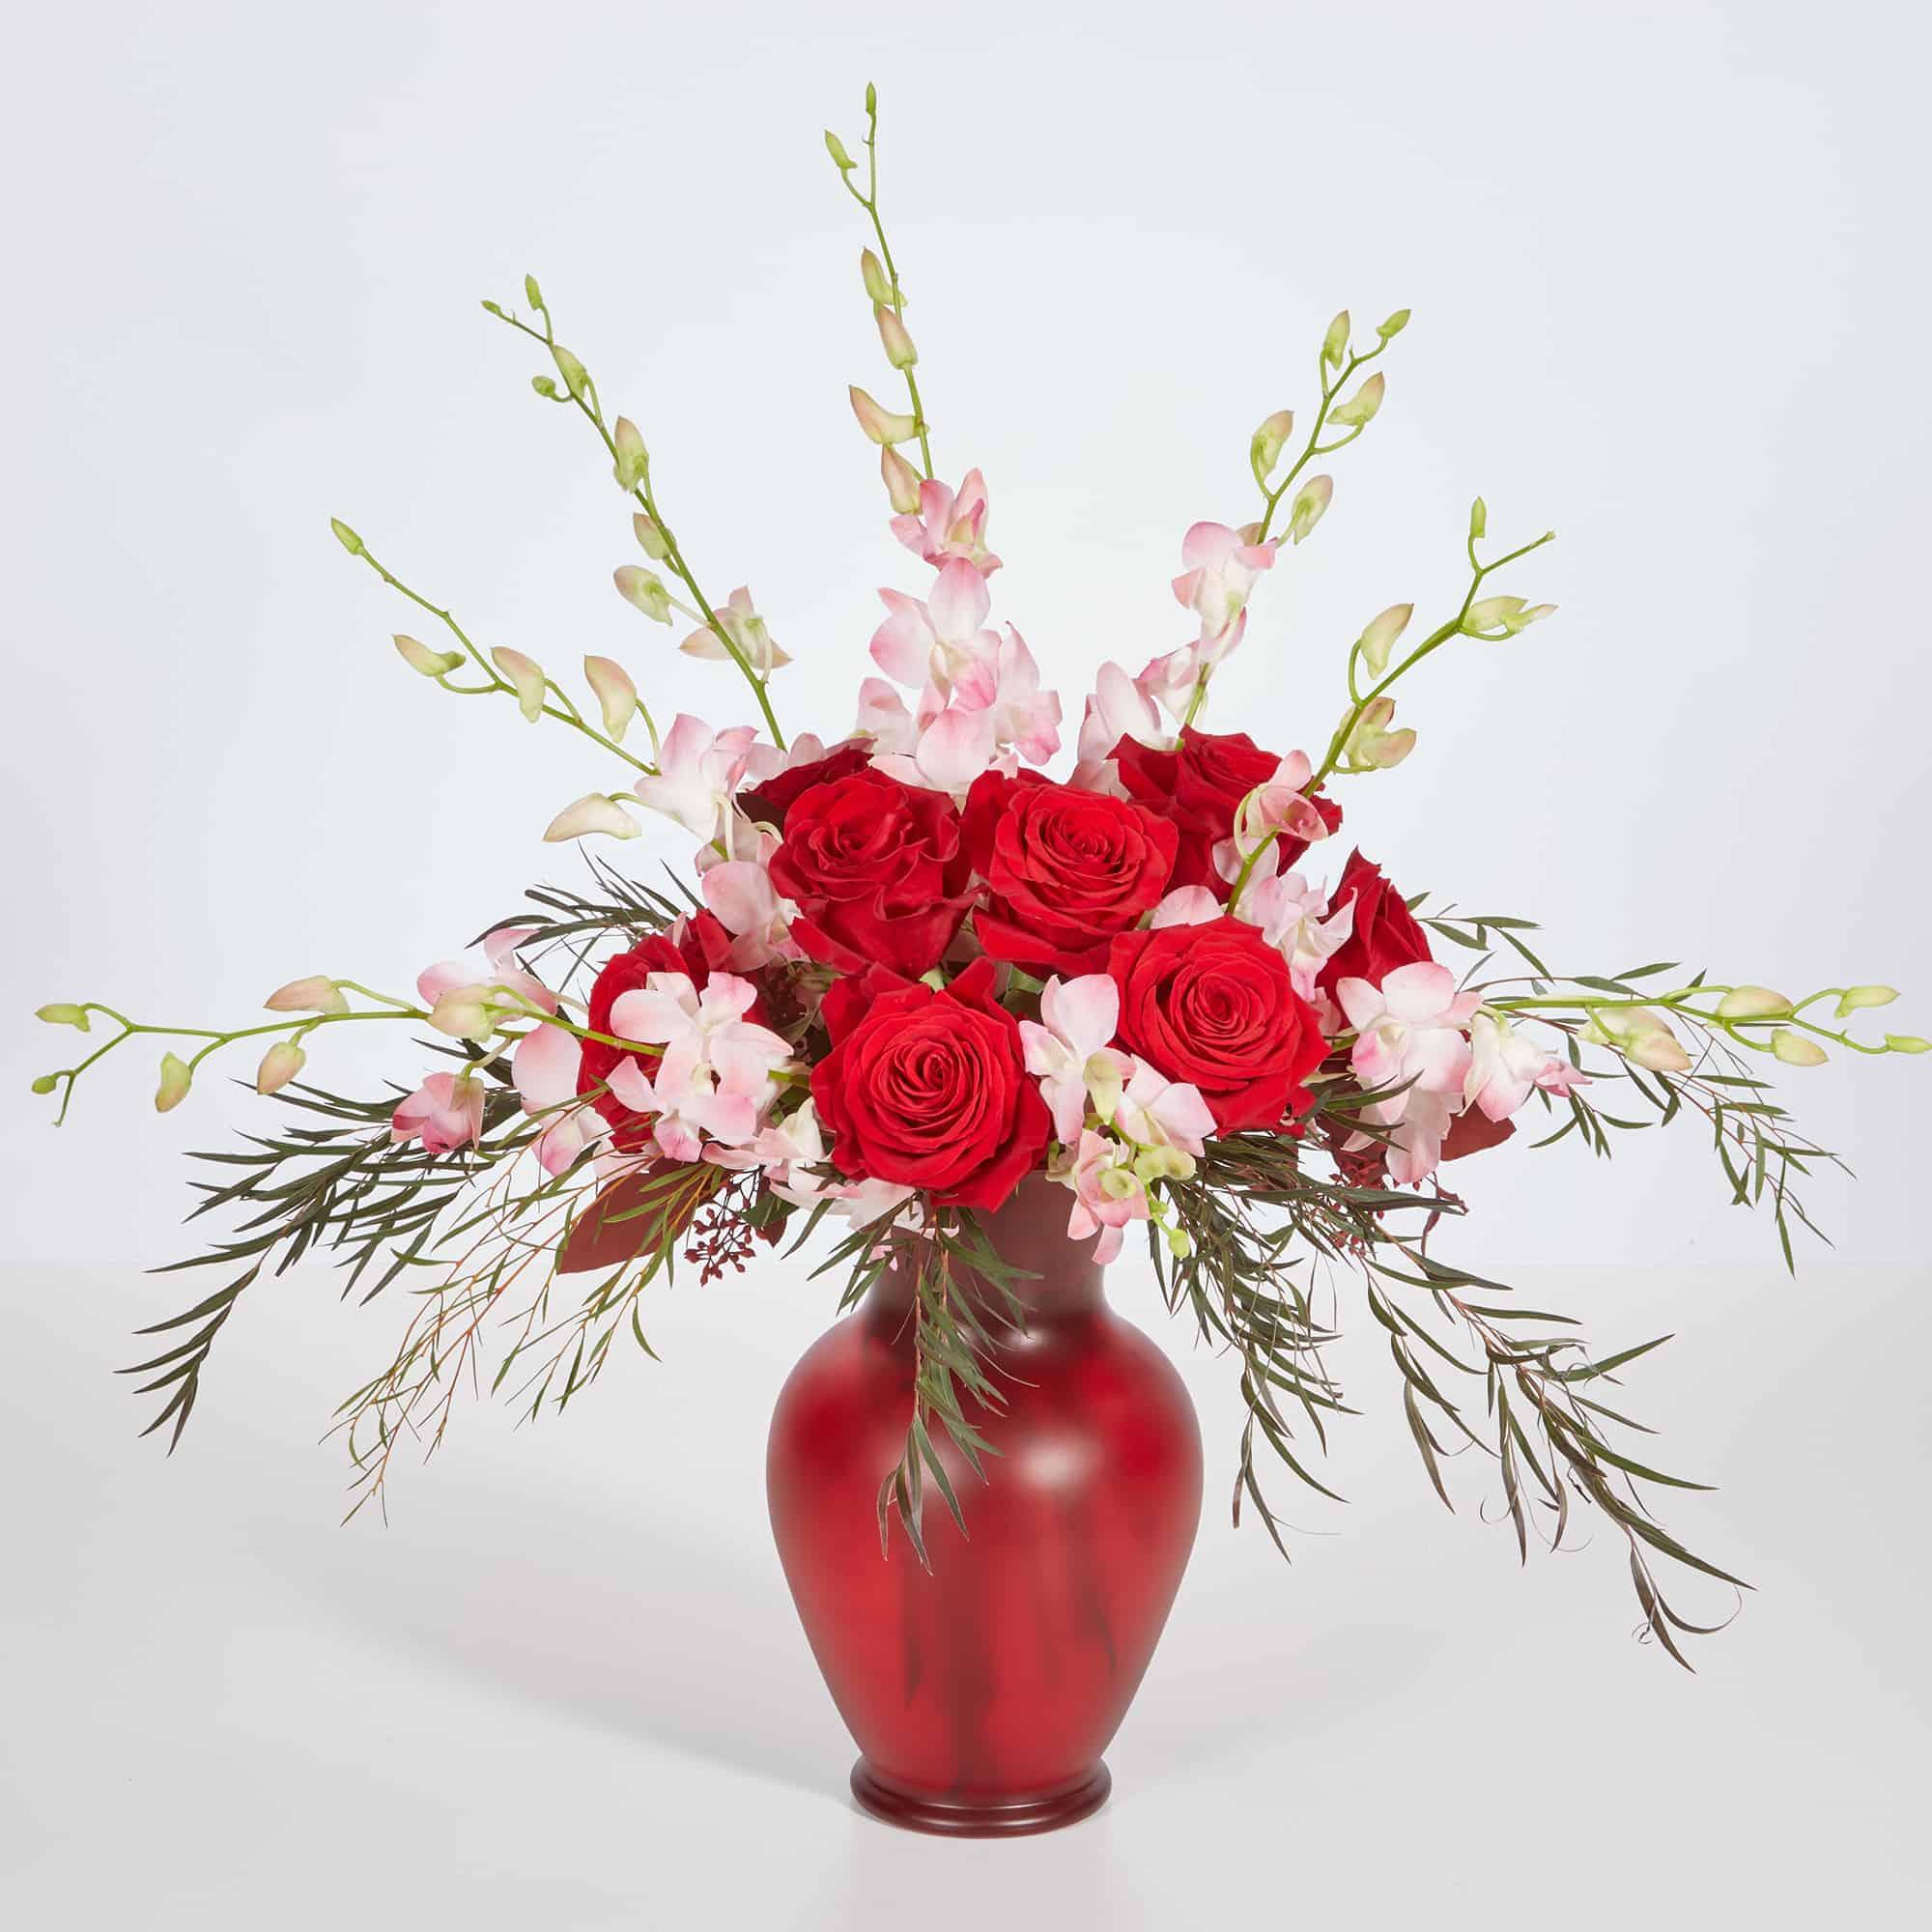 Red Bouquet Vase And Rose Valentine Centerpiece